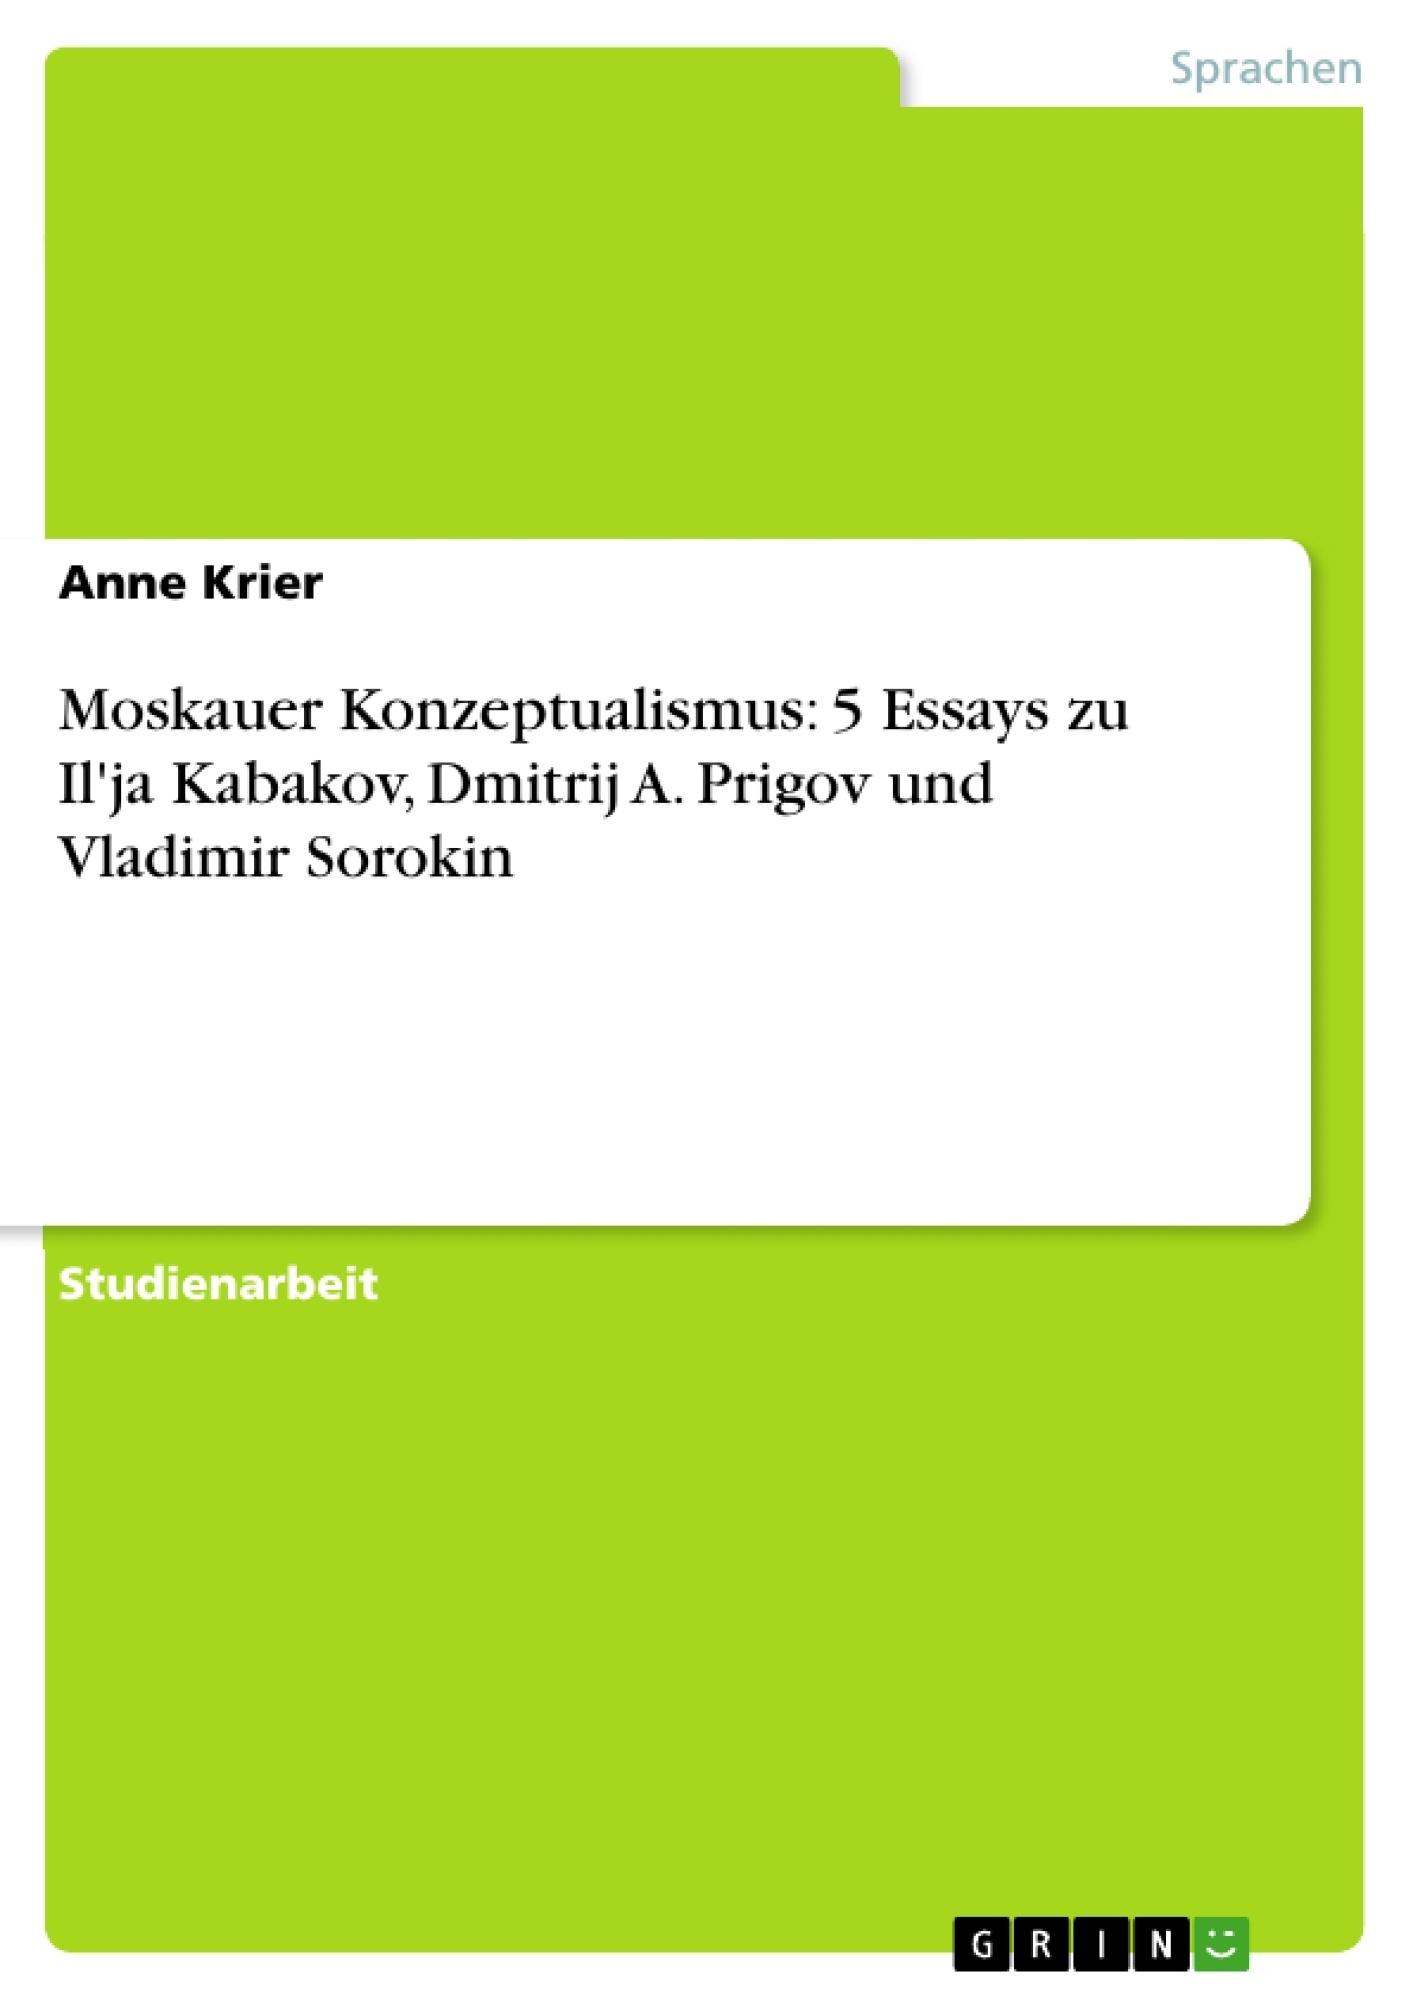 Titel: Moskauer Konzeptualismus: 5 Essays zu Il'ja Kabakov, Dmitrij A. Prigov und Vladimir Sorokin